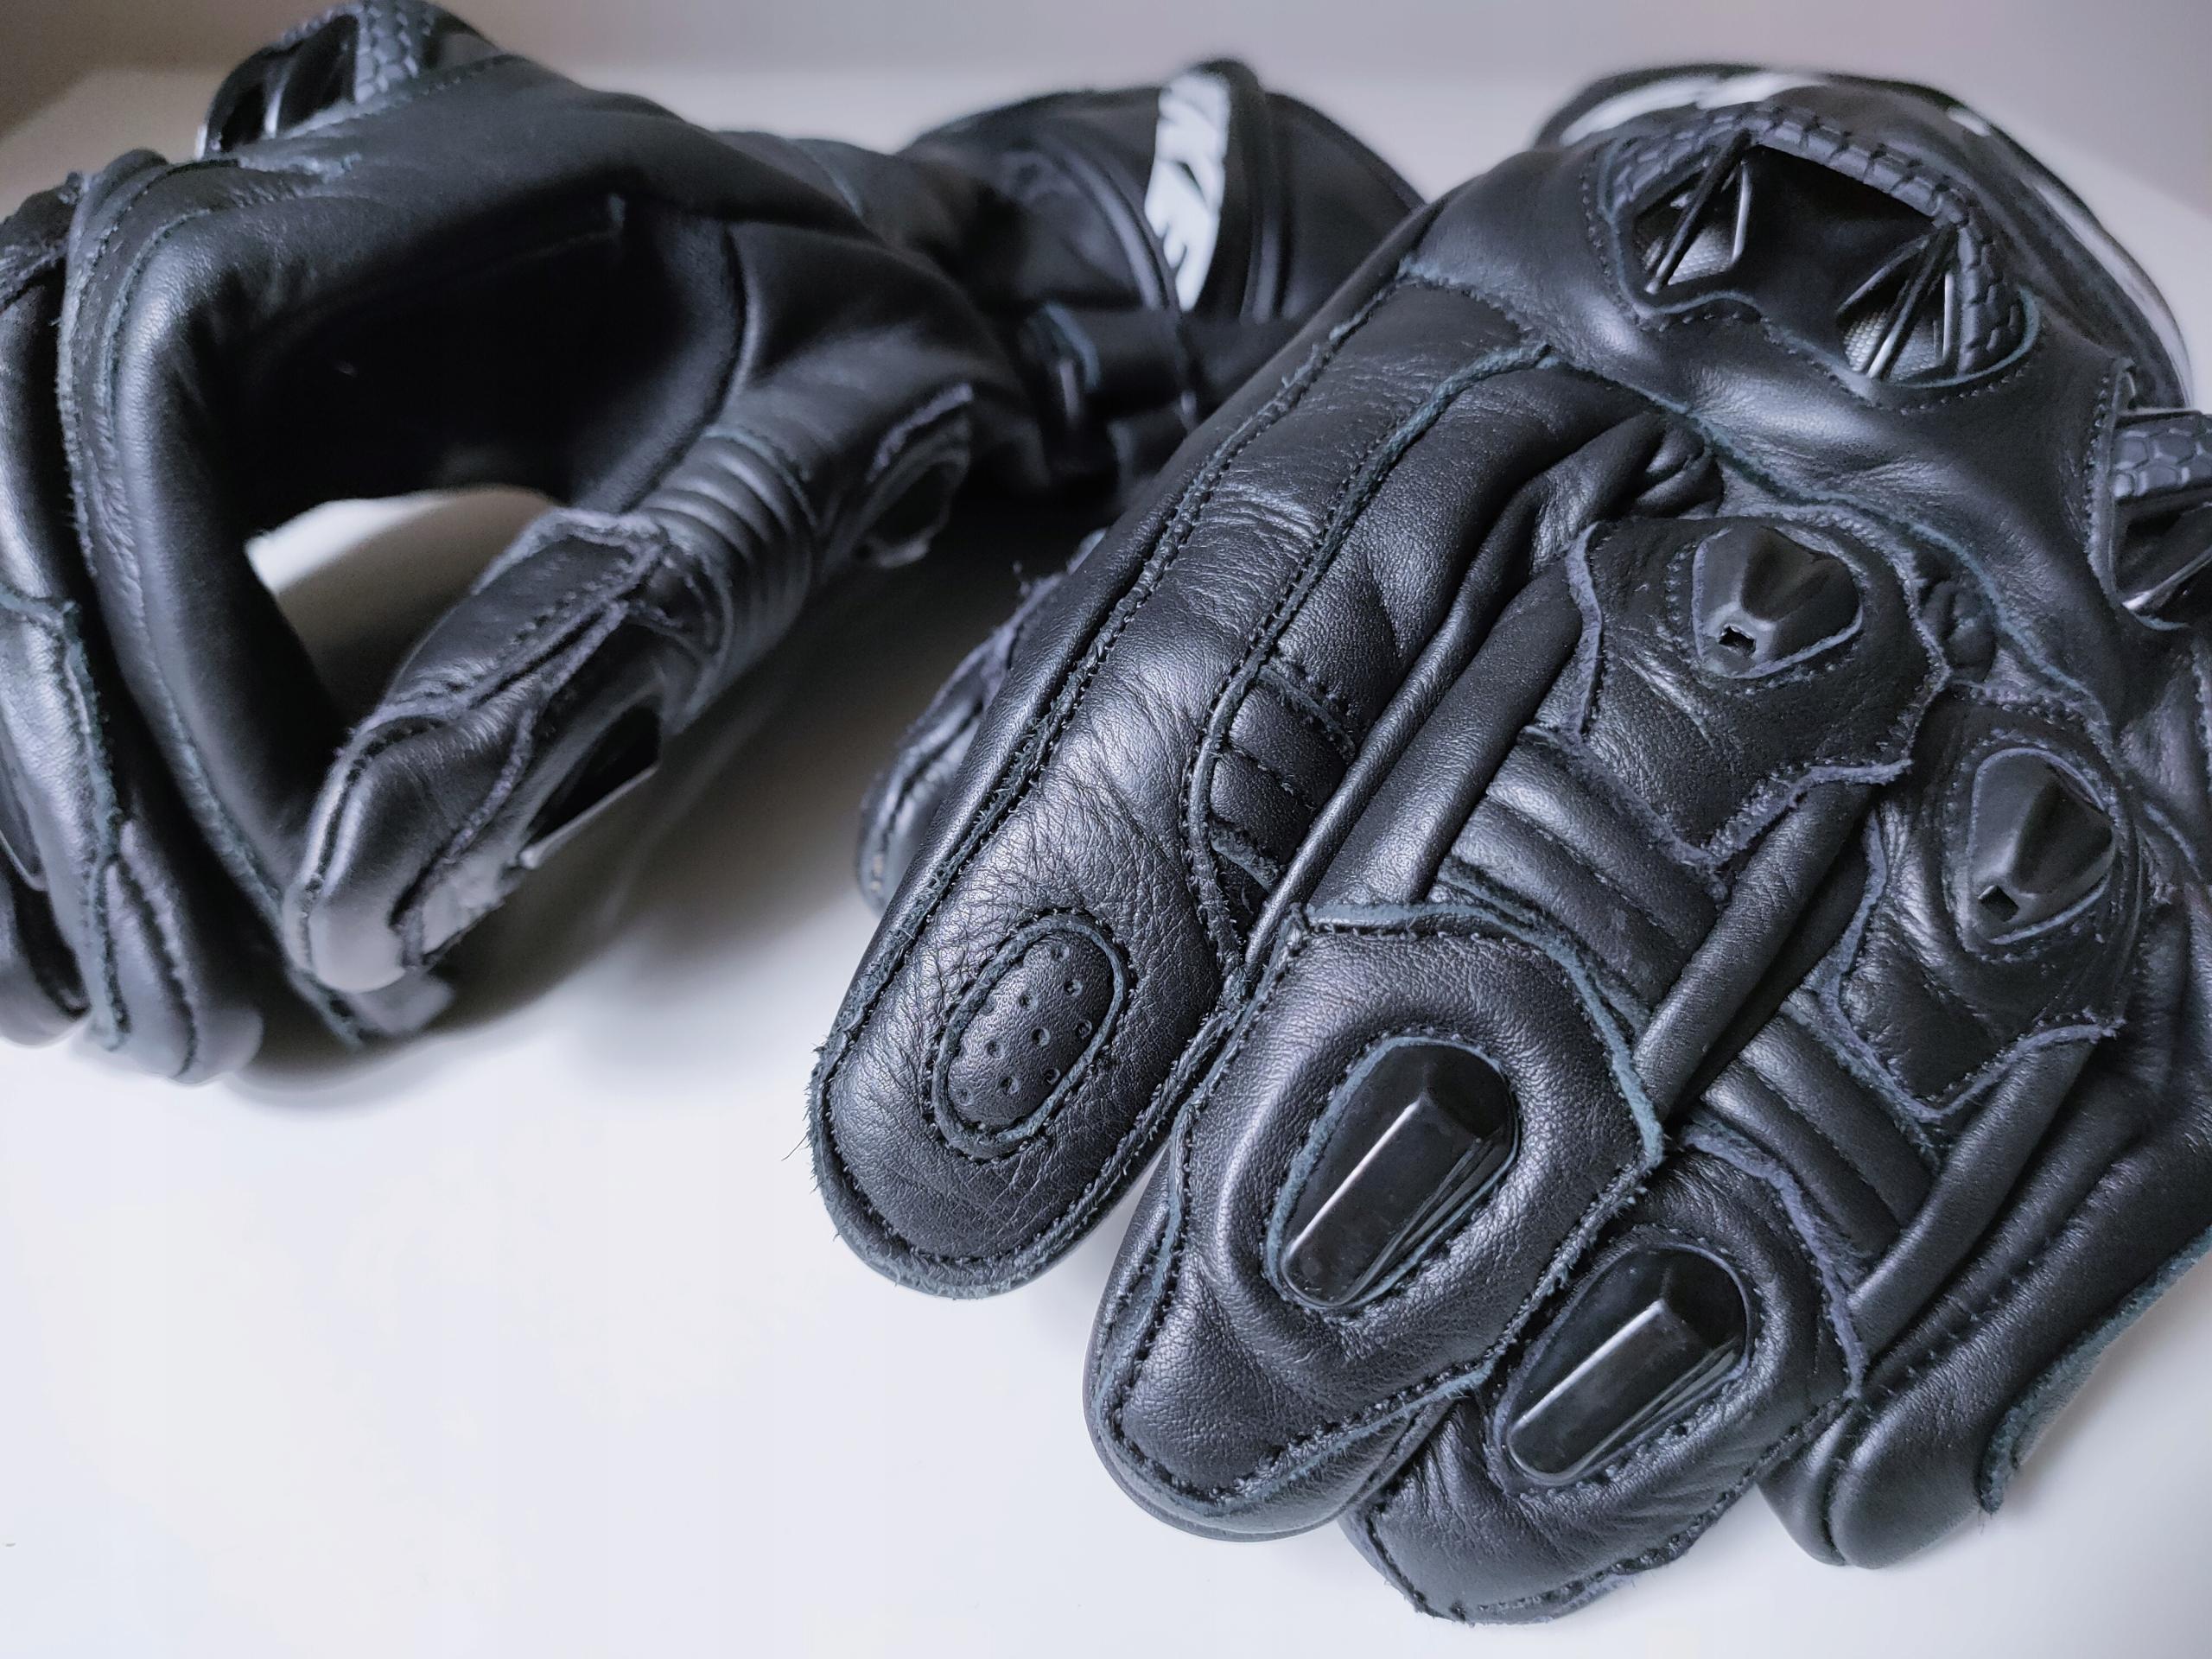 Перчатки мотоцикл spyke tech race - отправка gratis, фото 10